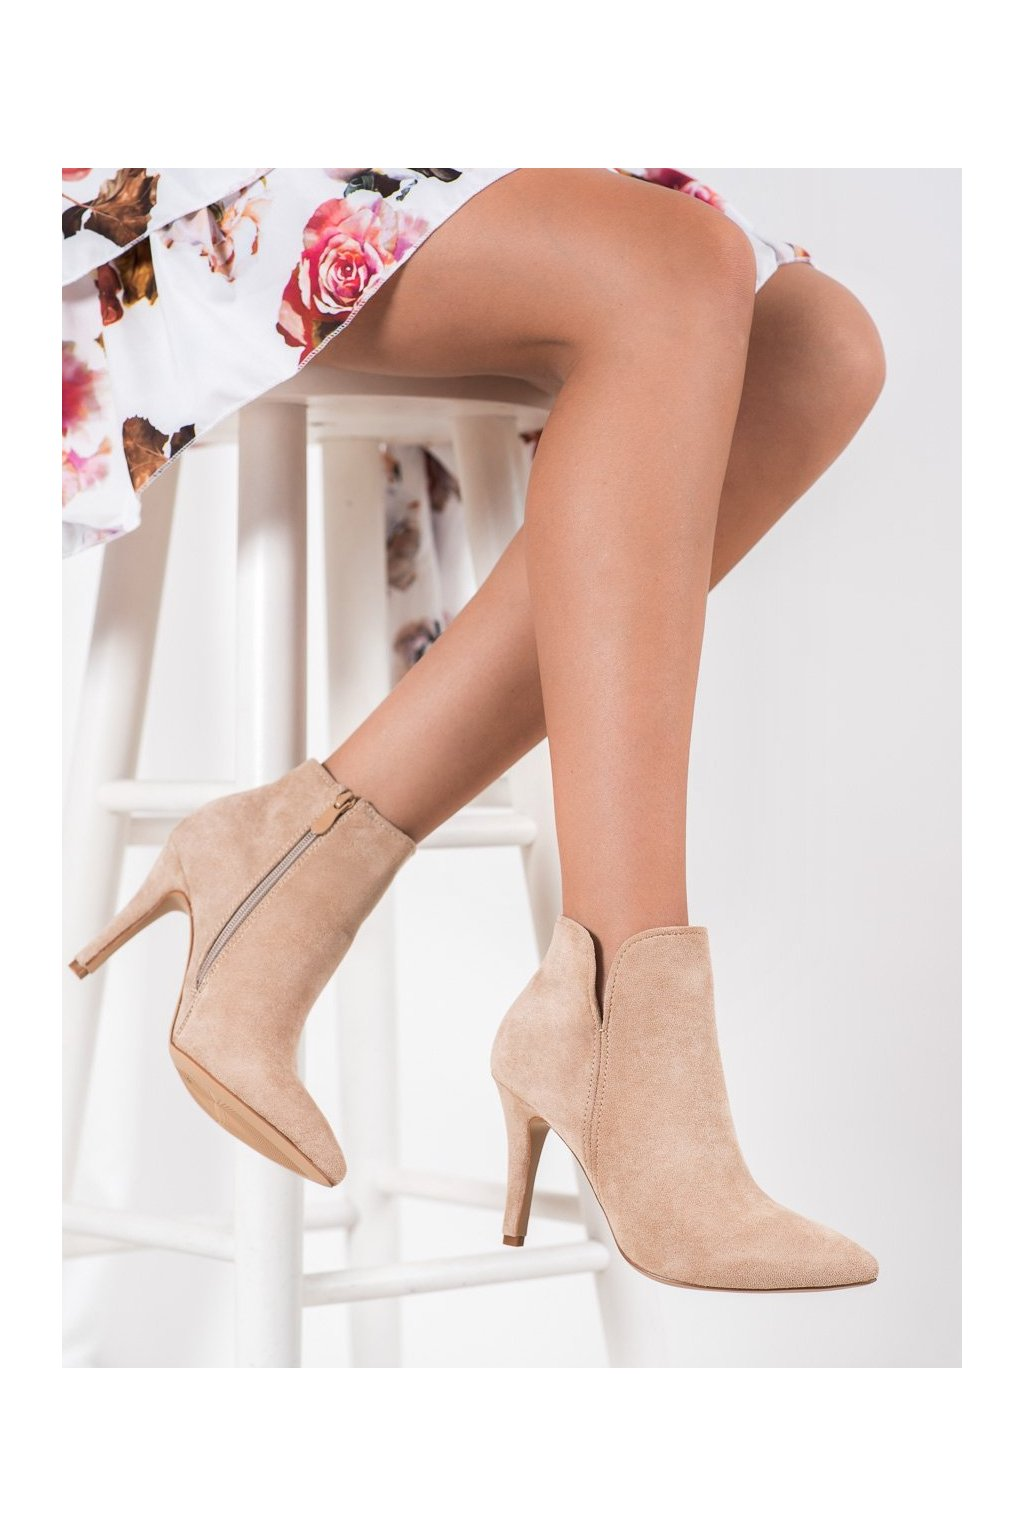 Hnedé dámske topánky Bella paris kod A8503KH